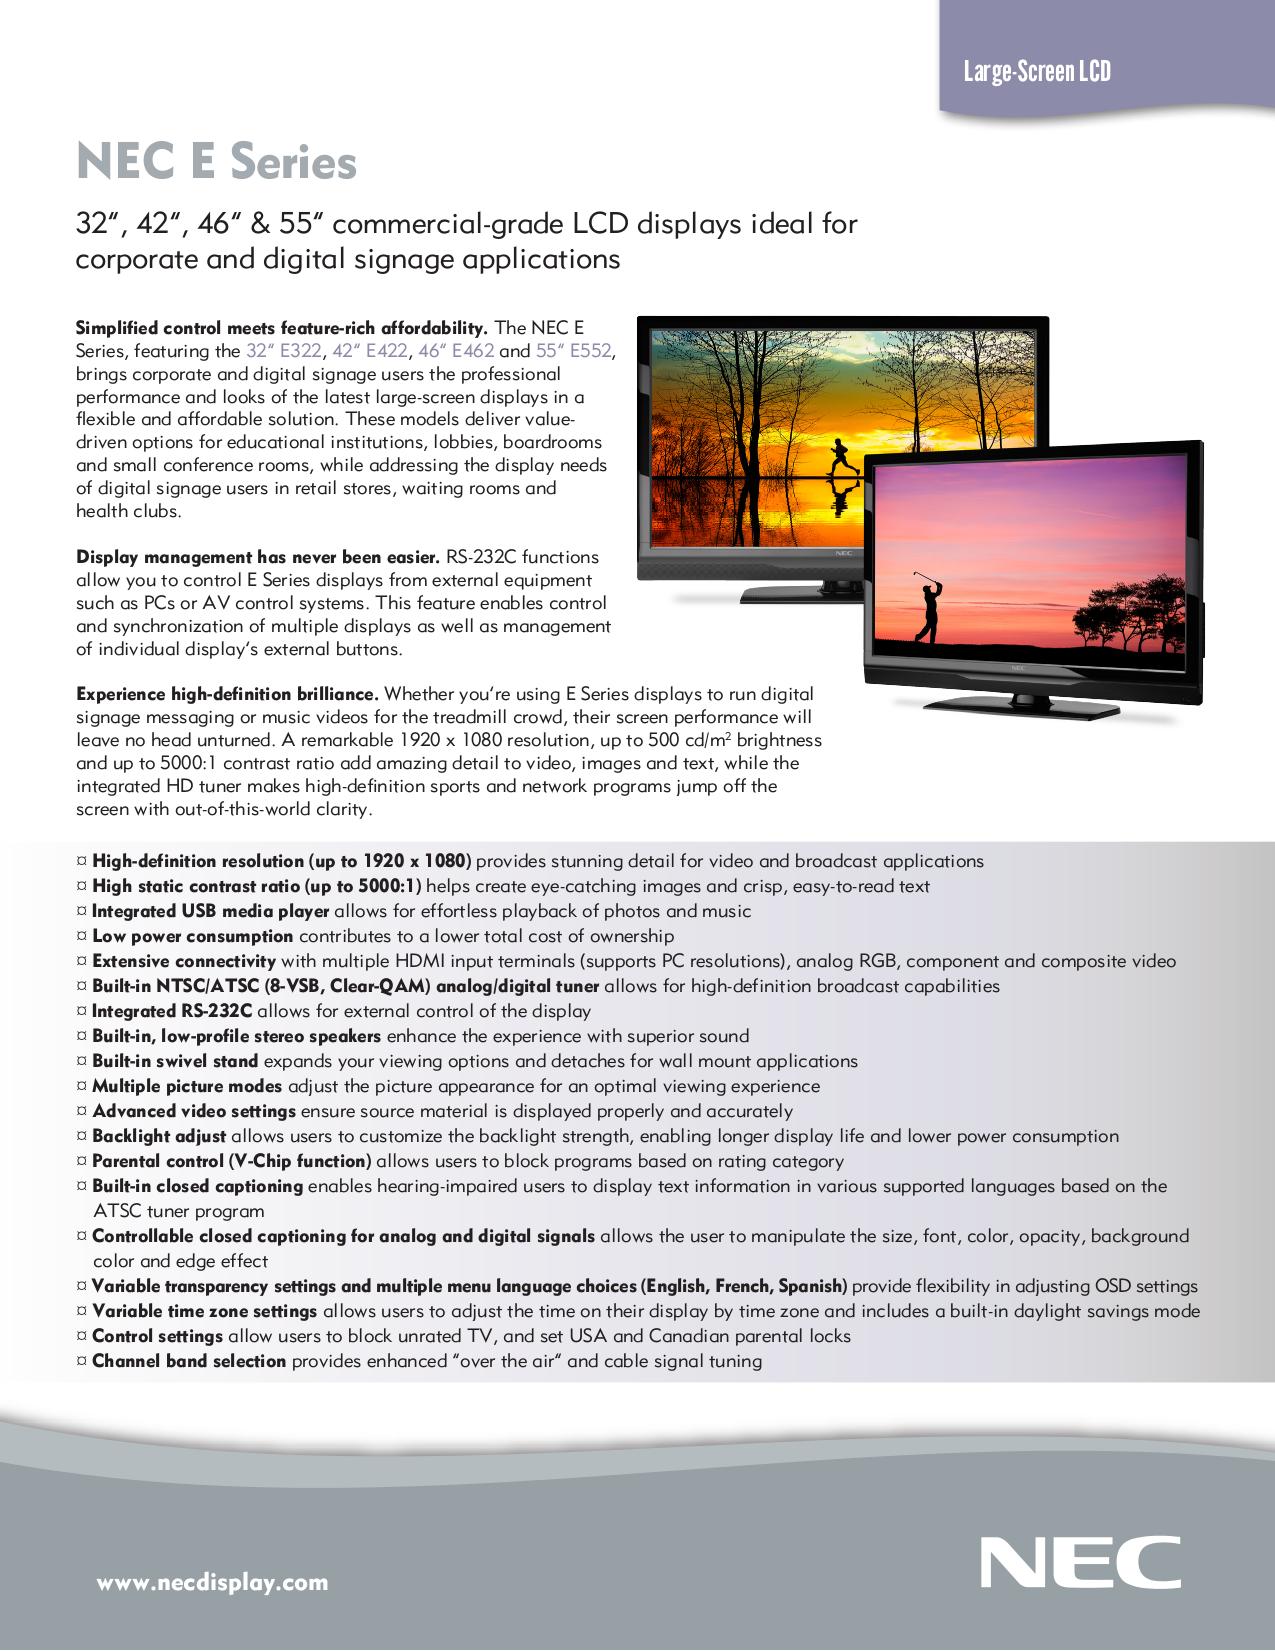 pdf for NEC Plasma TV E462 manual